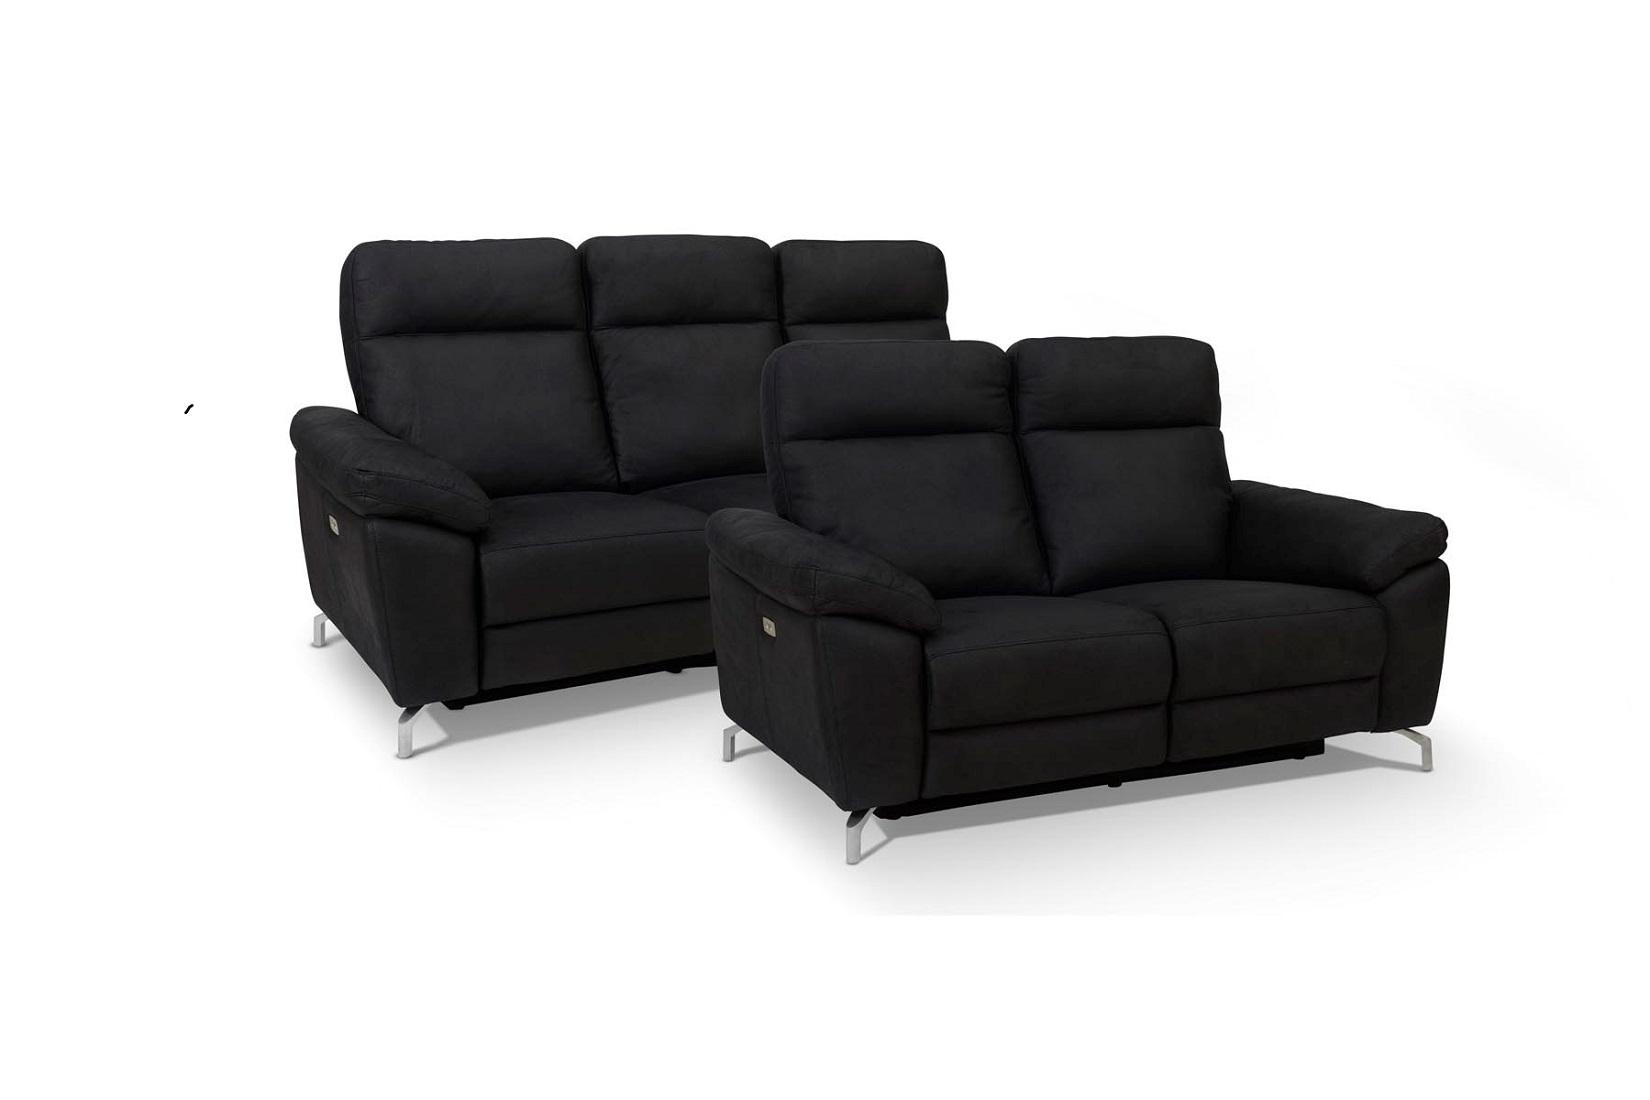 Furnistore Designová 2-místná sedačka Abeeku, černá